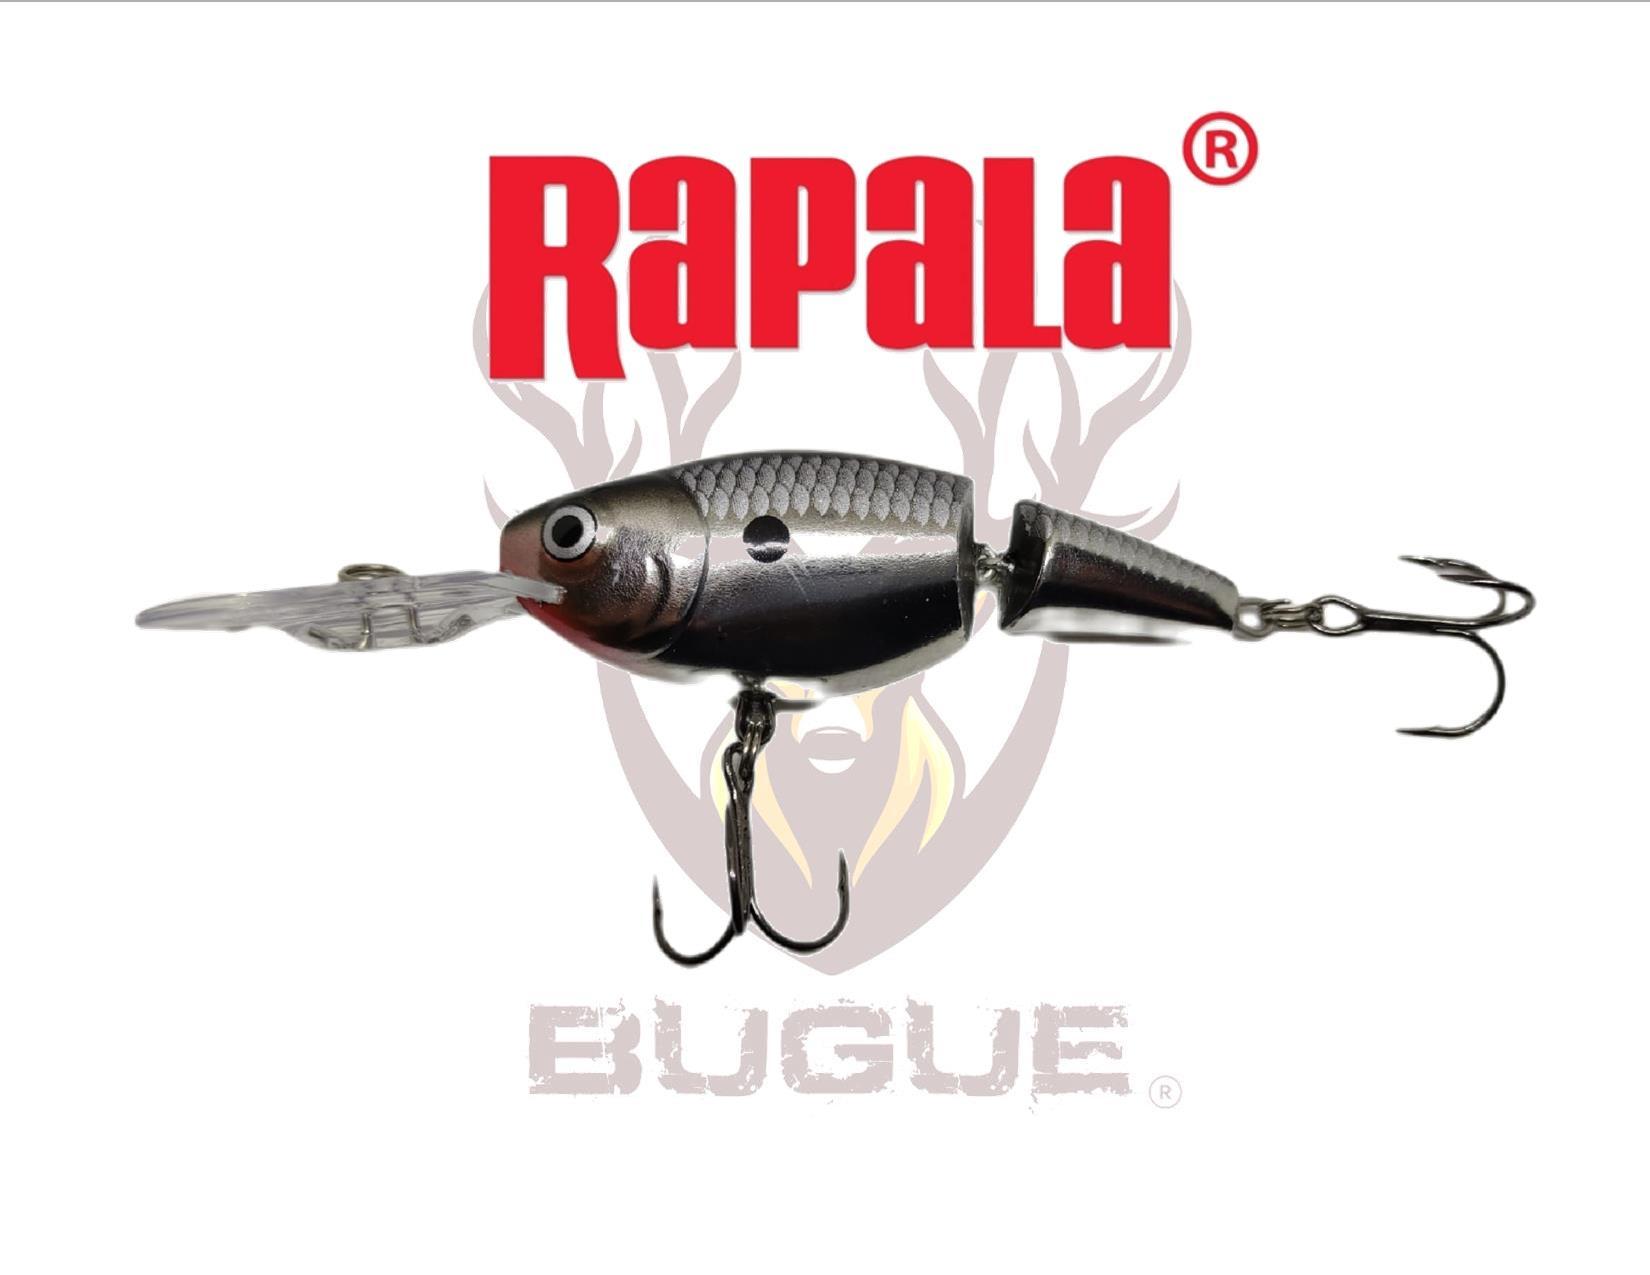 Señuelo Marca: Rapala modelo JSR-7 suspending